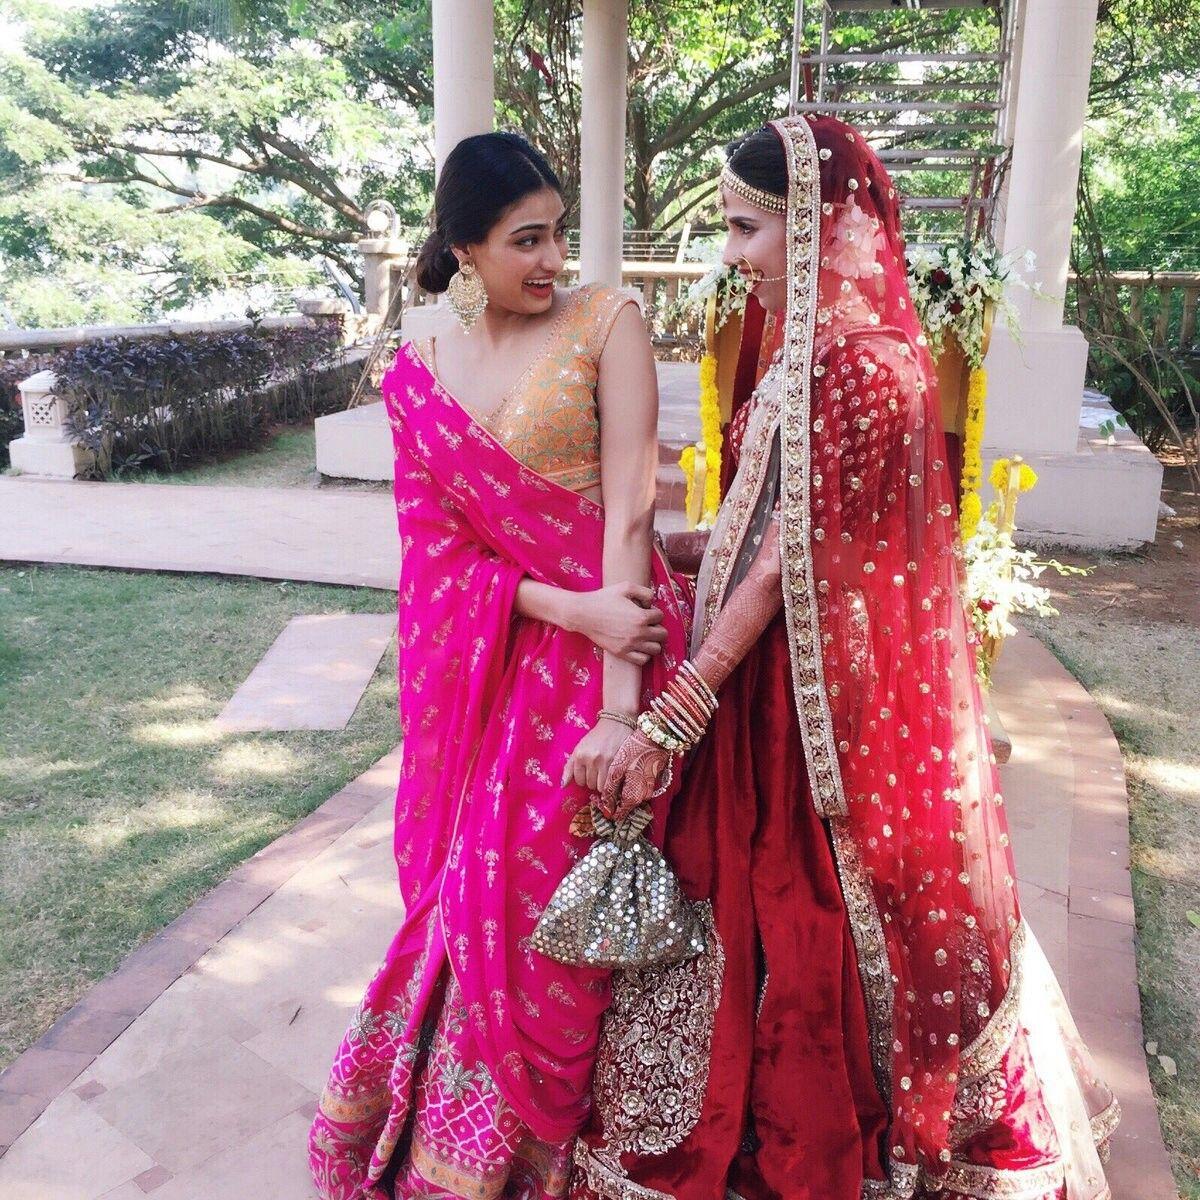 Pin de Rakhi choudhary en Brides | Pinterest